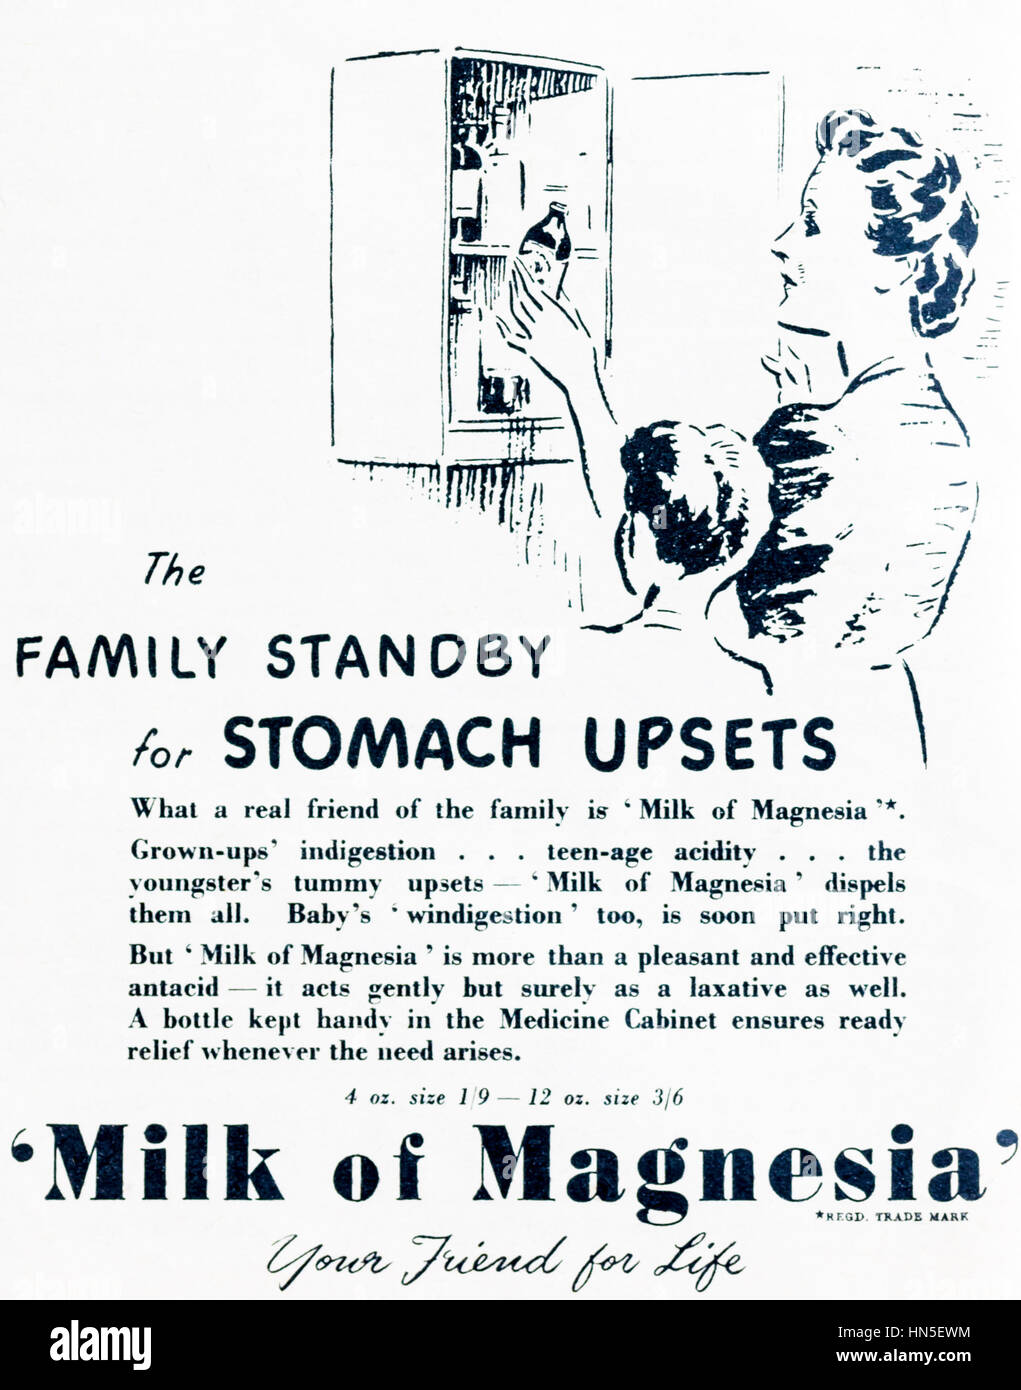 1950s magazine advertisement for Milk of Magnesia. - Stock Image